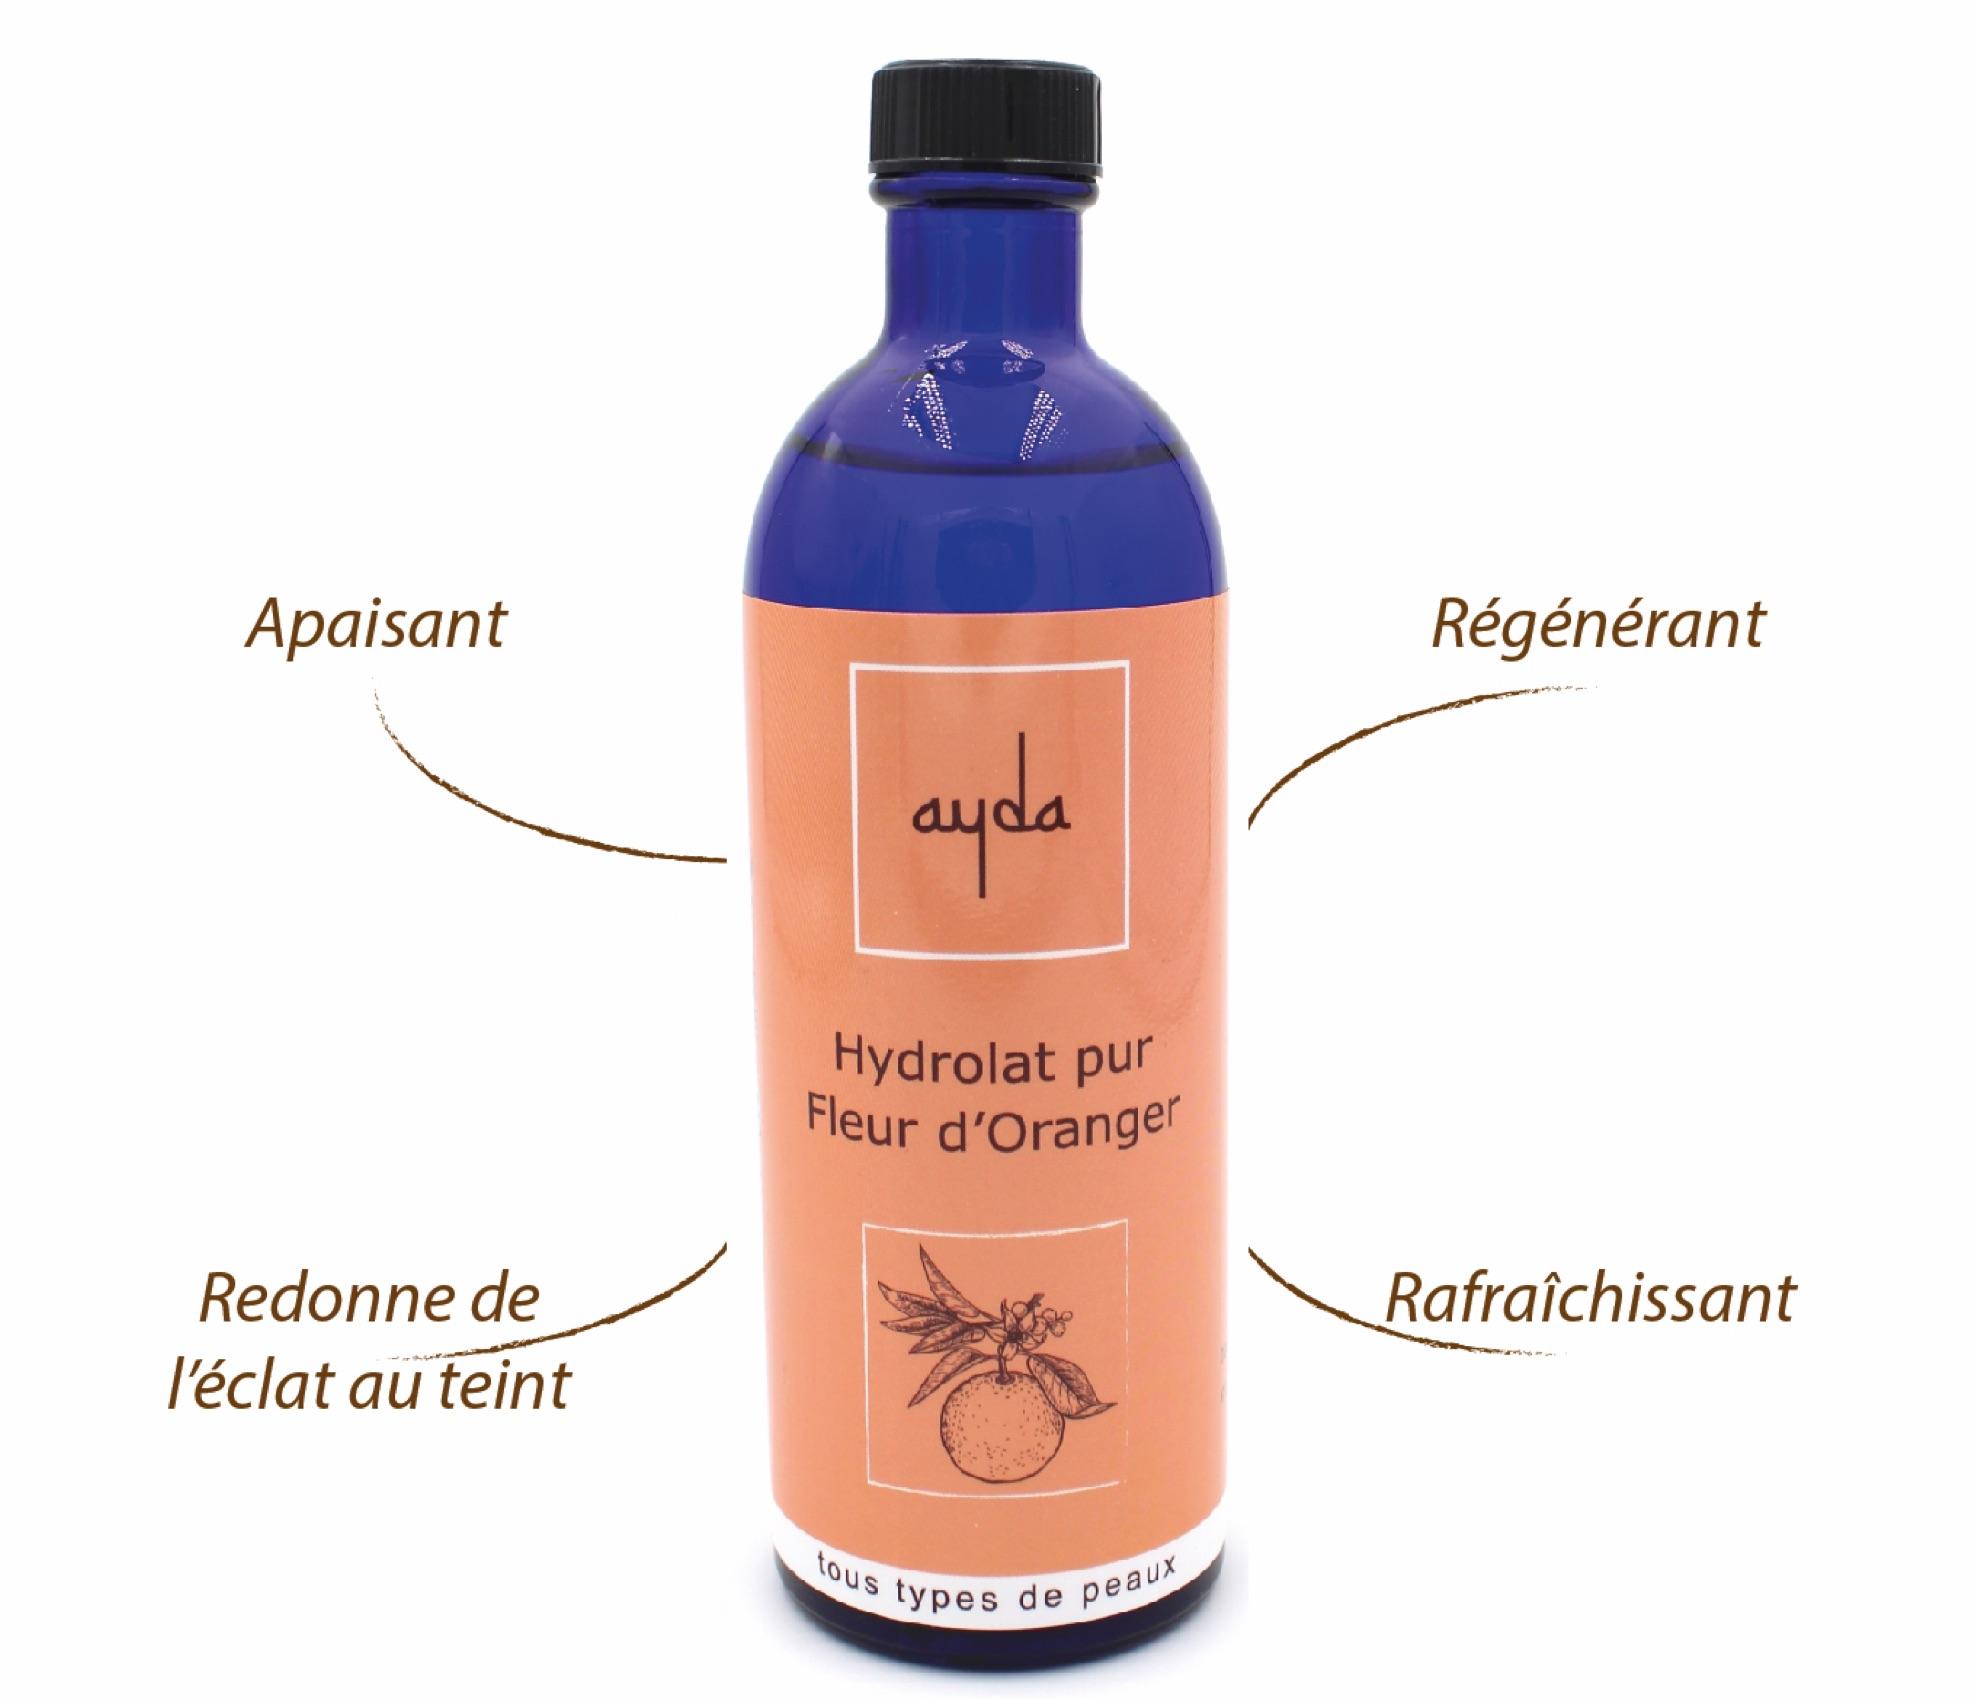 bienfaits hydrolat fleur oranger bio